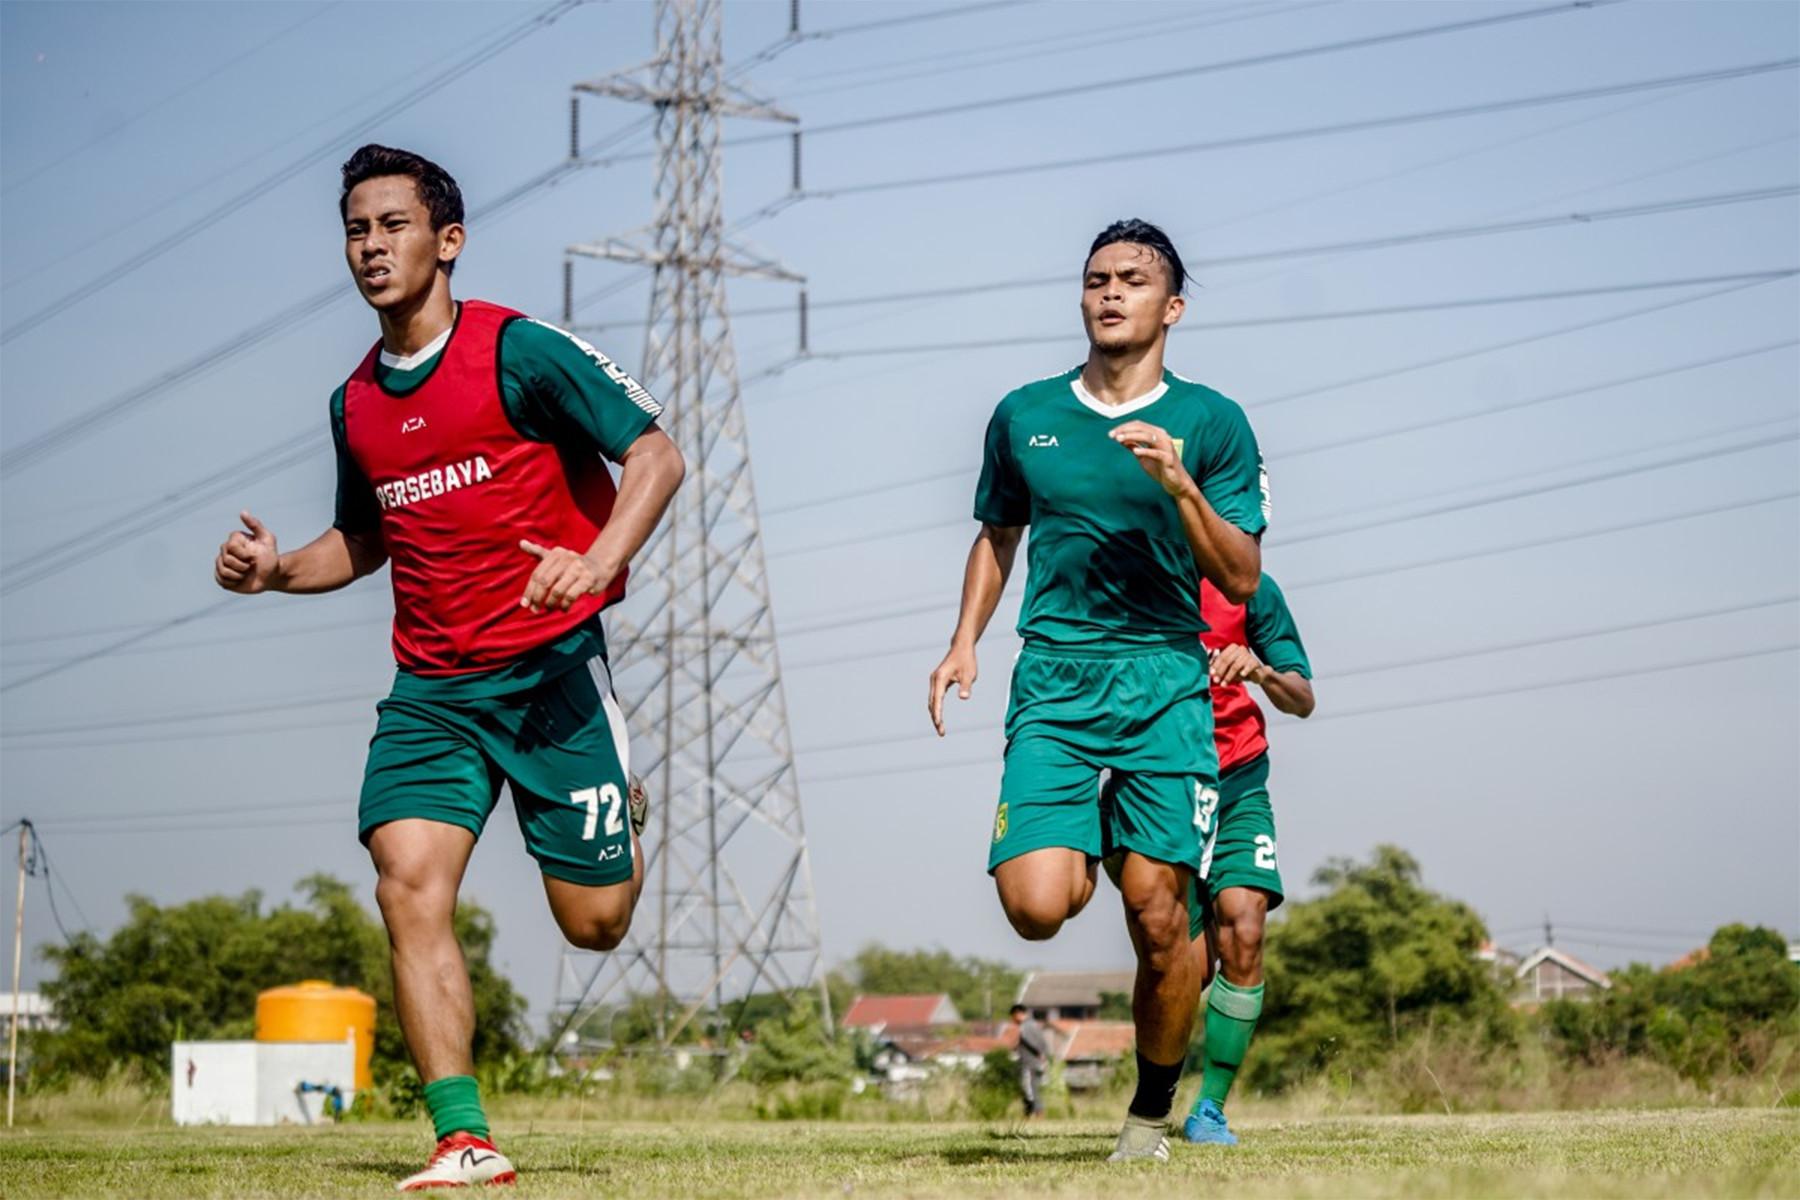 Persebaya Berat Lepas Pemain ke Timnas Setelah Arif Cedera - JPNN.com